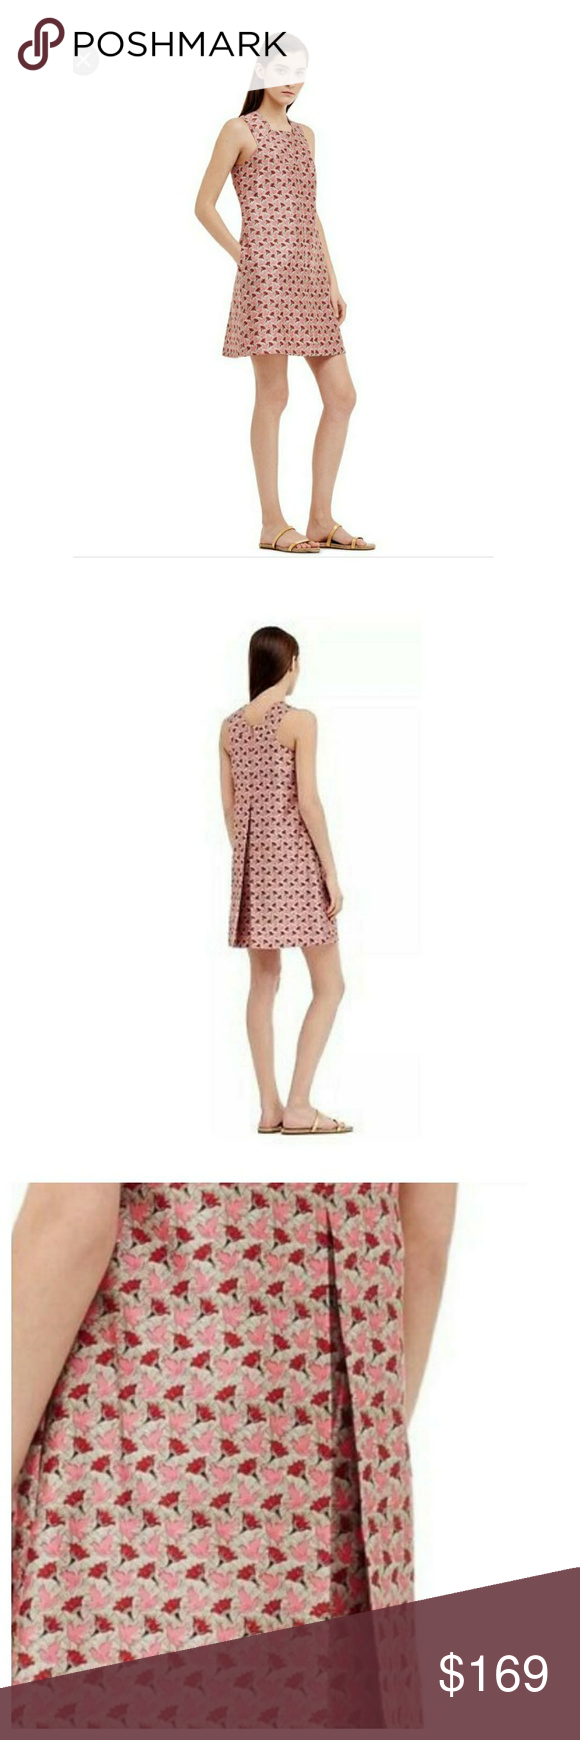 ec94692f2b56 Tory Burch Silk Gazar Square Neck Dress Tory Burch Silk Gazar Square Neck  Dress Size  8 Material  100% Silk Measurements  Chest  34 in. Length  36 in.